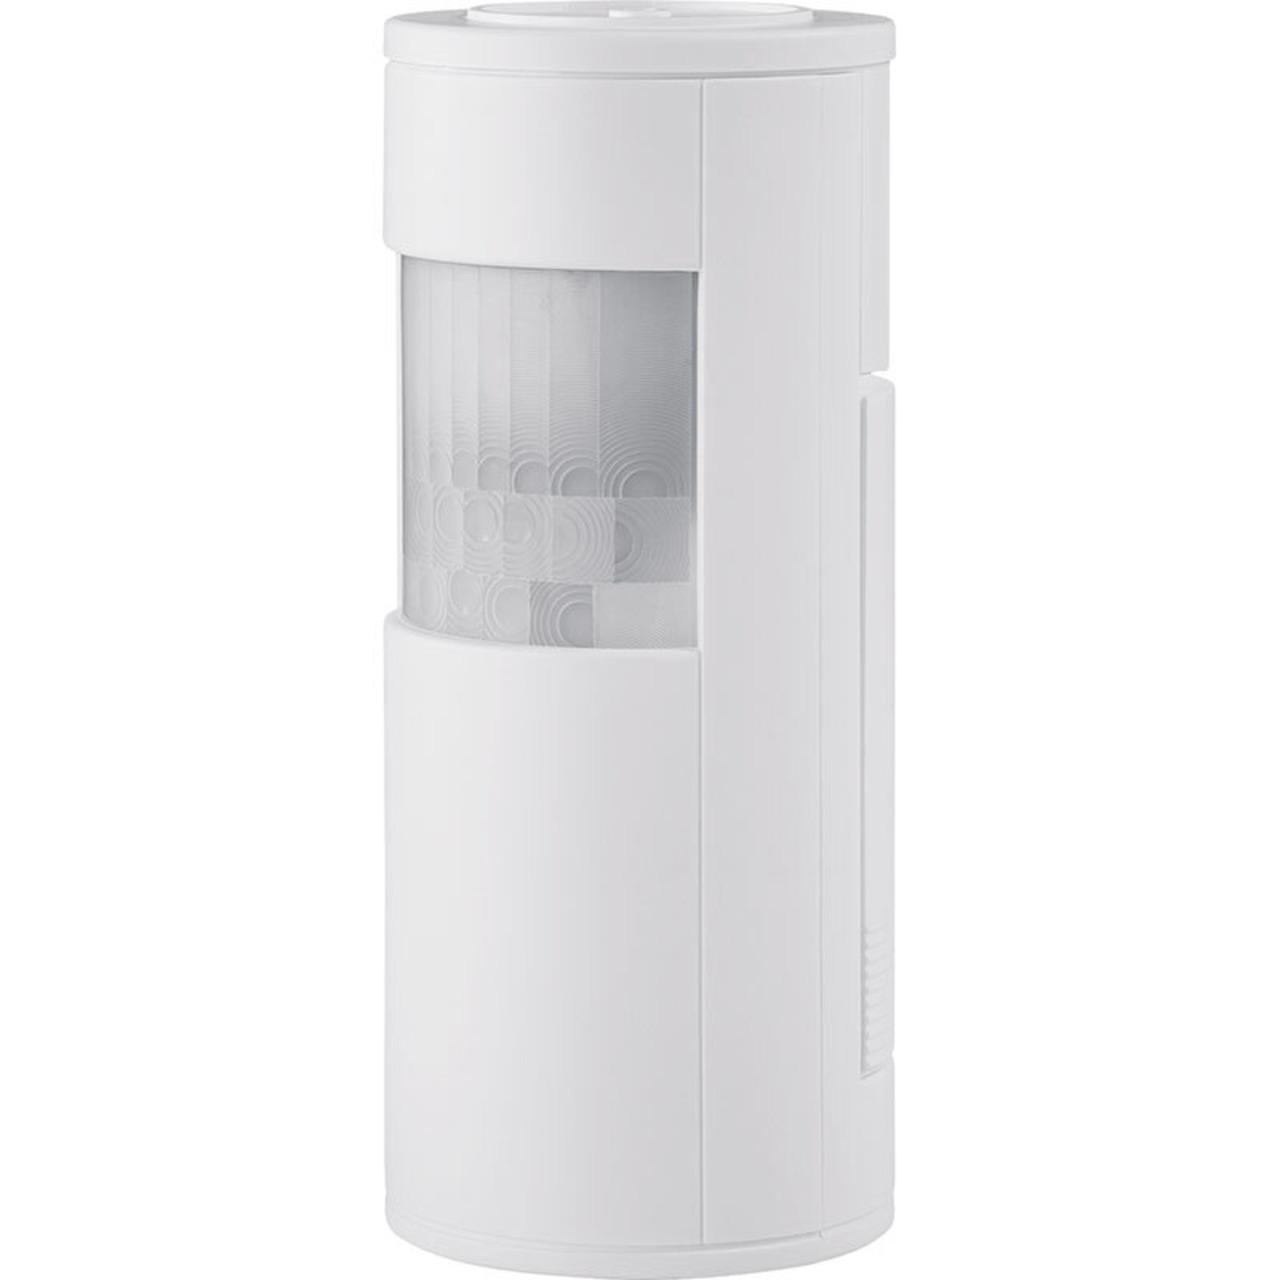 Homematic Funk-IR-Bewegungsmelder HM-Sec-MDIR-3 innen für Smart Home - Hausautomation